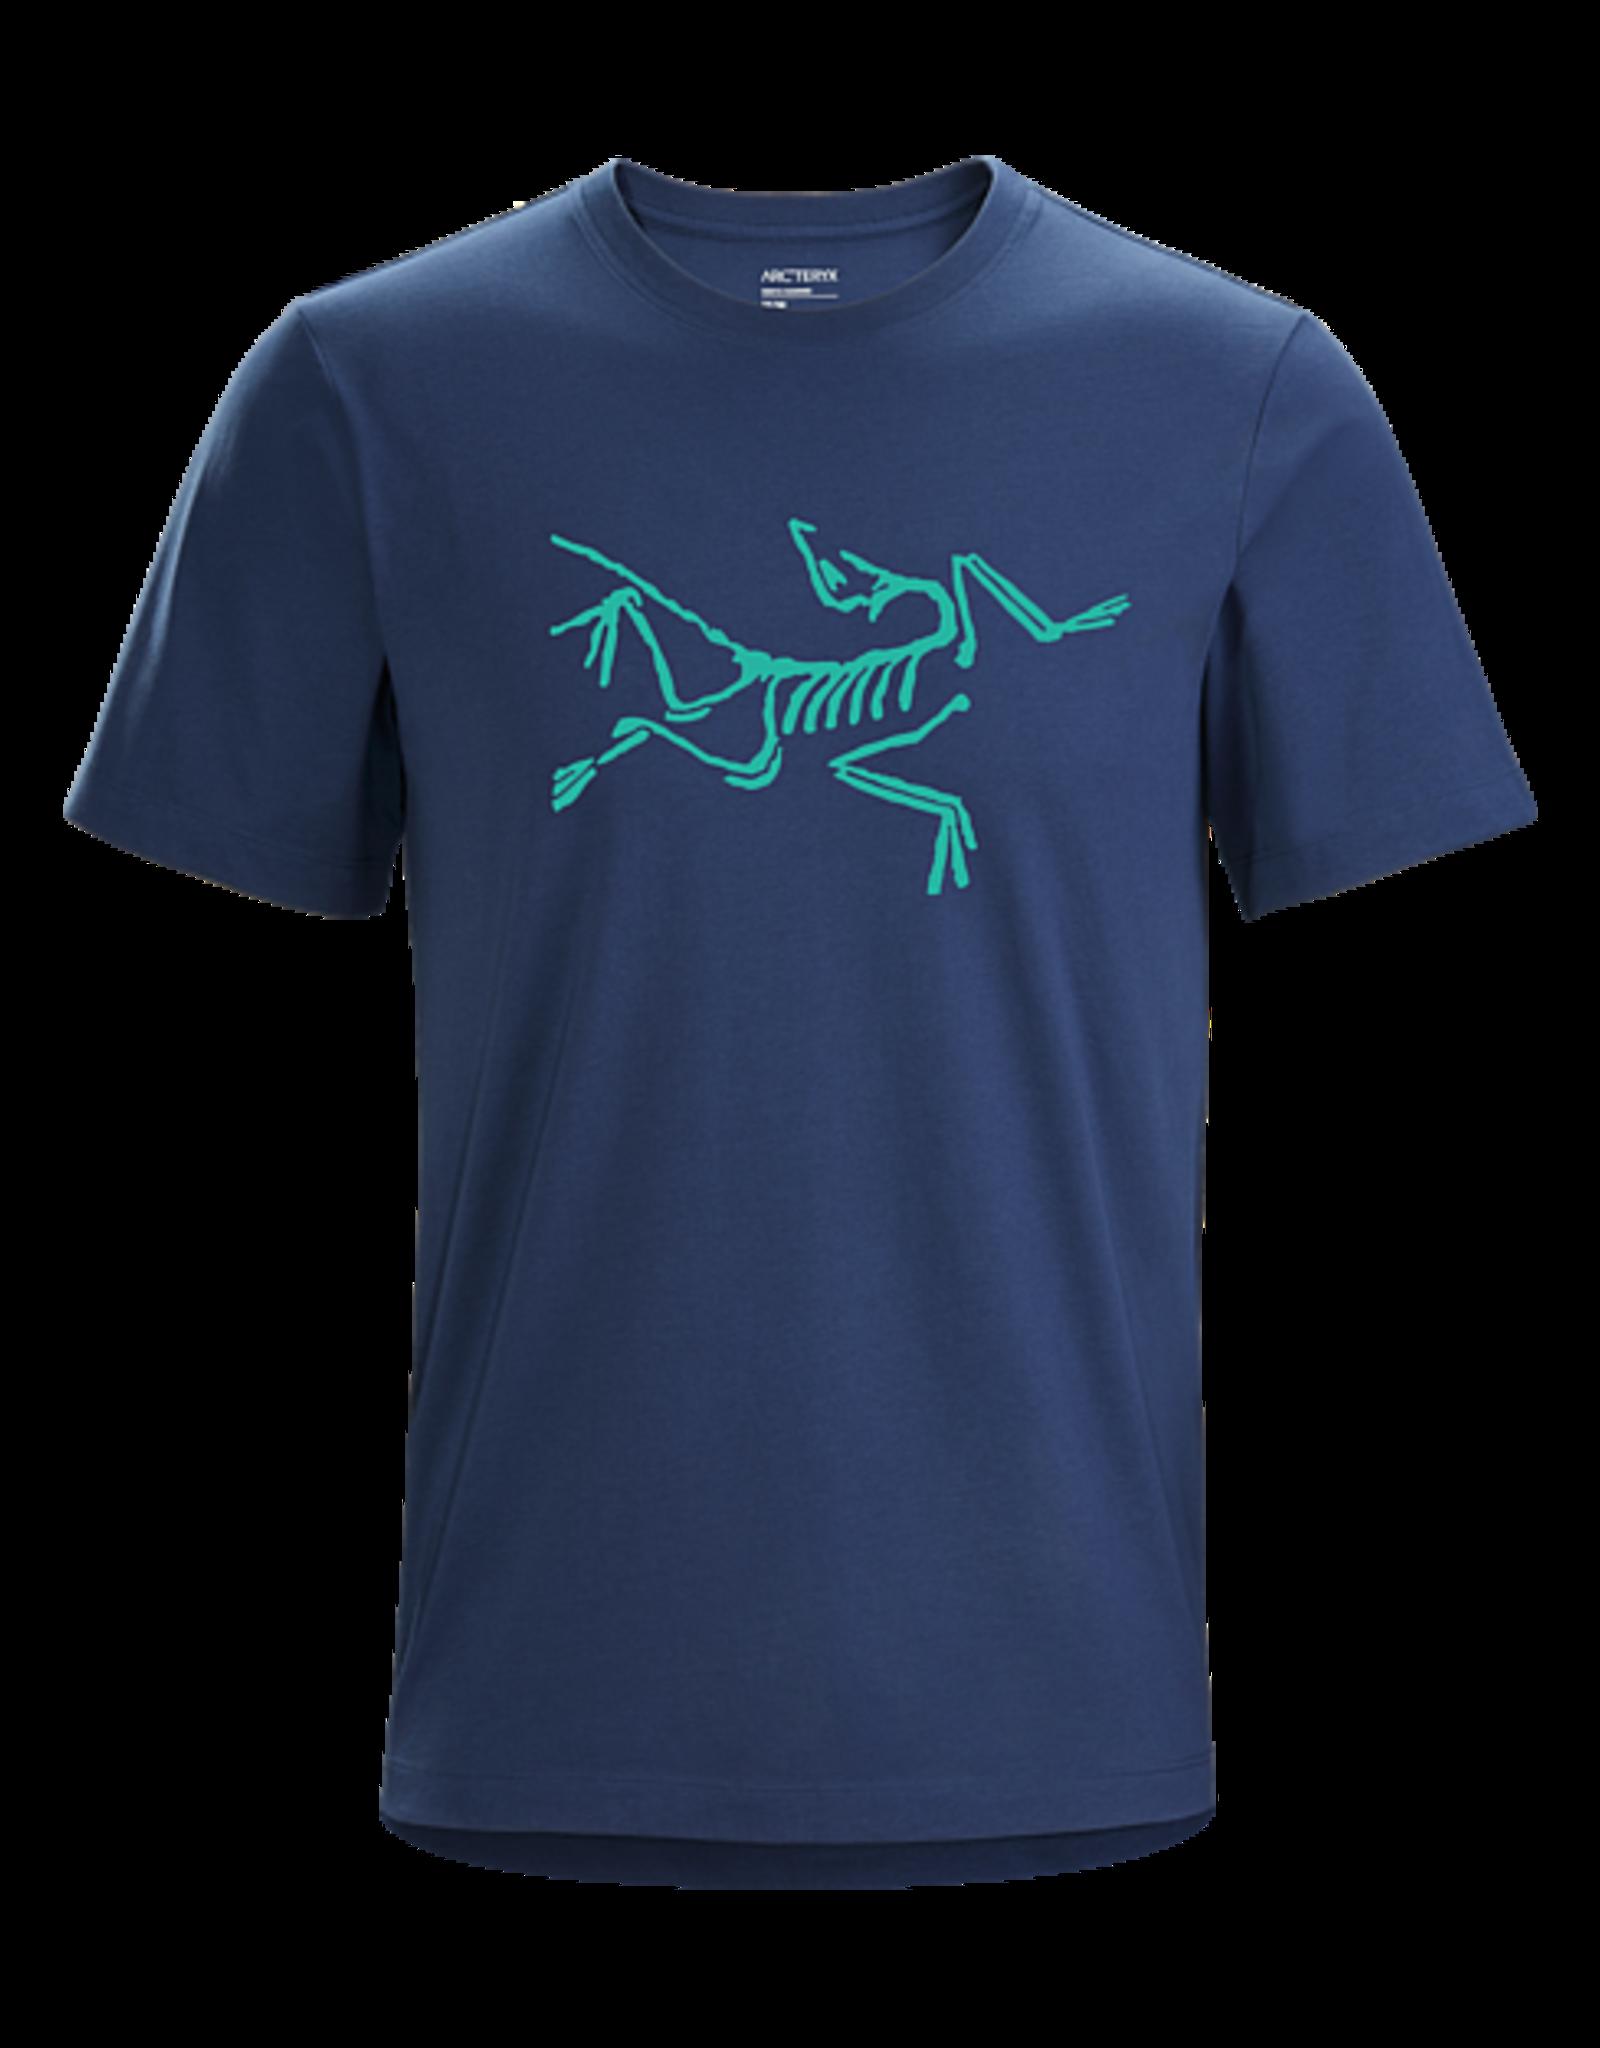 Arc'teryx Arc'teryx Men's Archaeopteryx T-Shirt